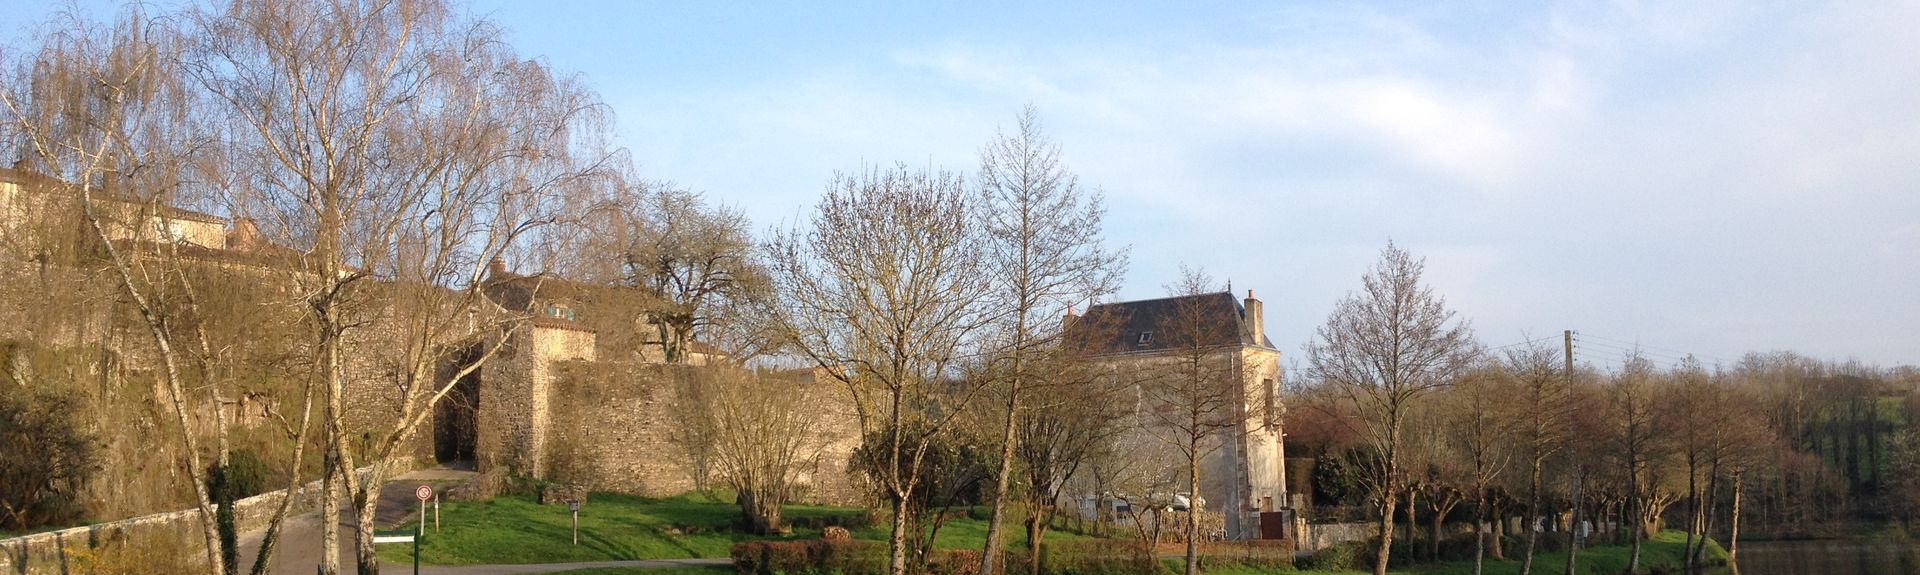 Saint-Maurice-le-Girard, France